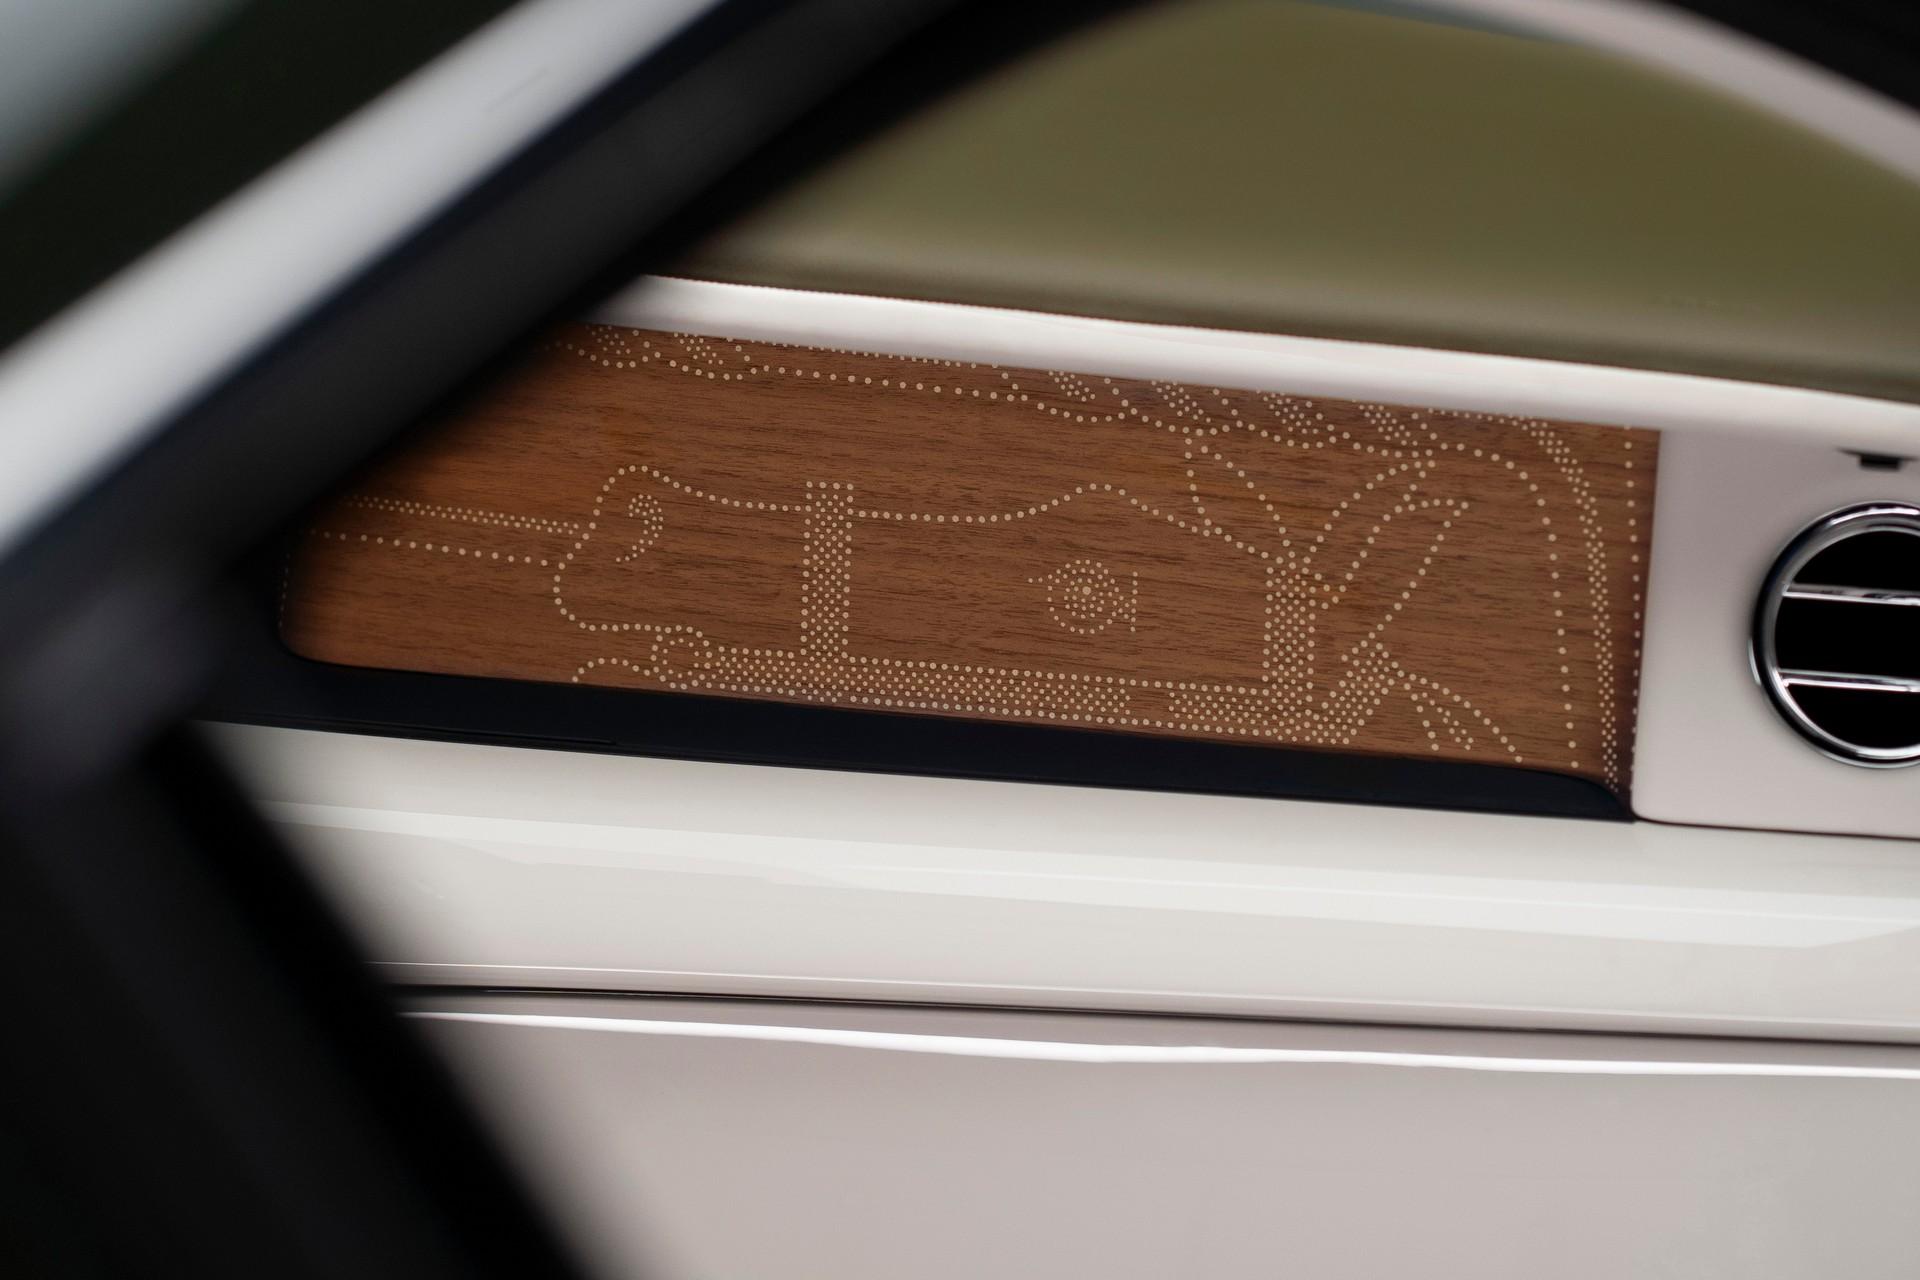 Rolls-Royce-Phantom-Oribe-12.jpg